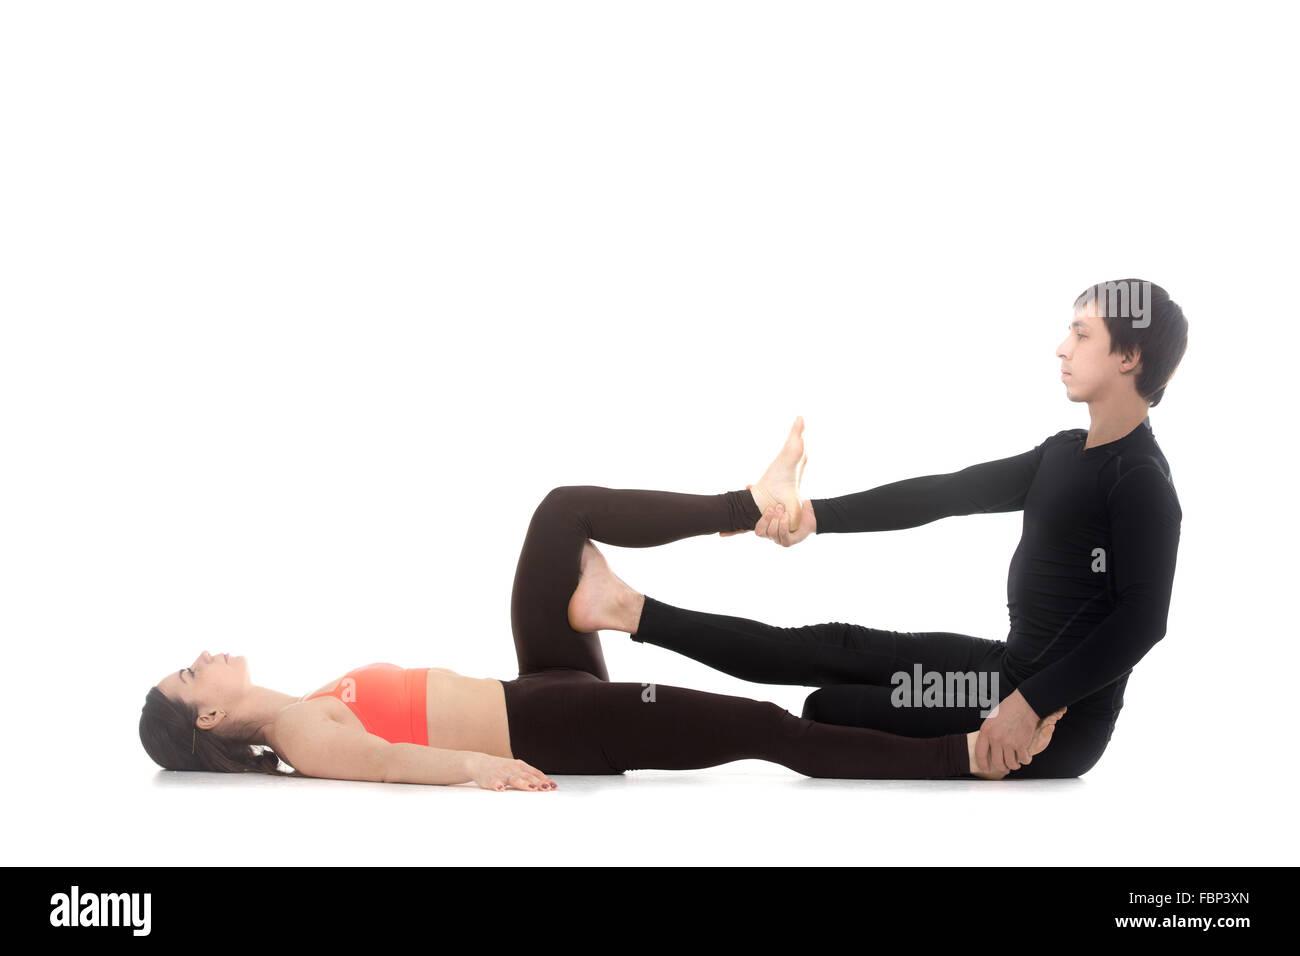 Dos personas practicando yoga deportivo con pareja joven coaching ... 4d1f3fcf45dc